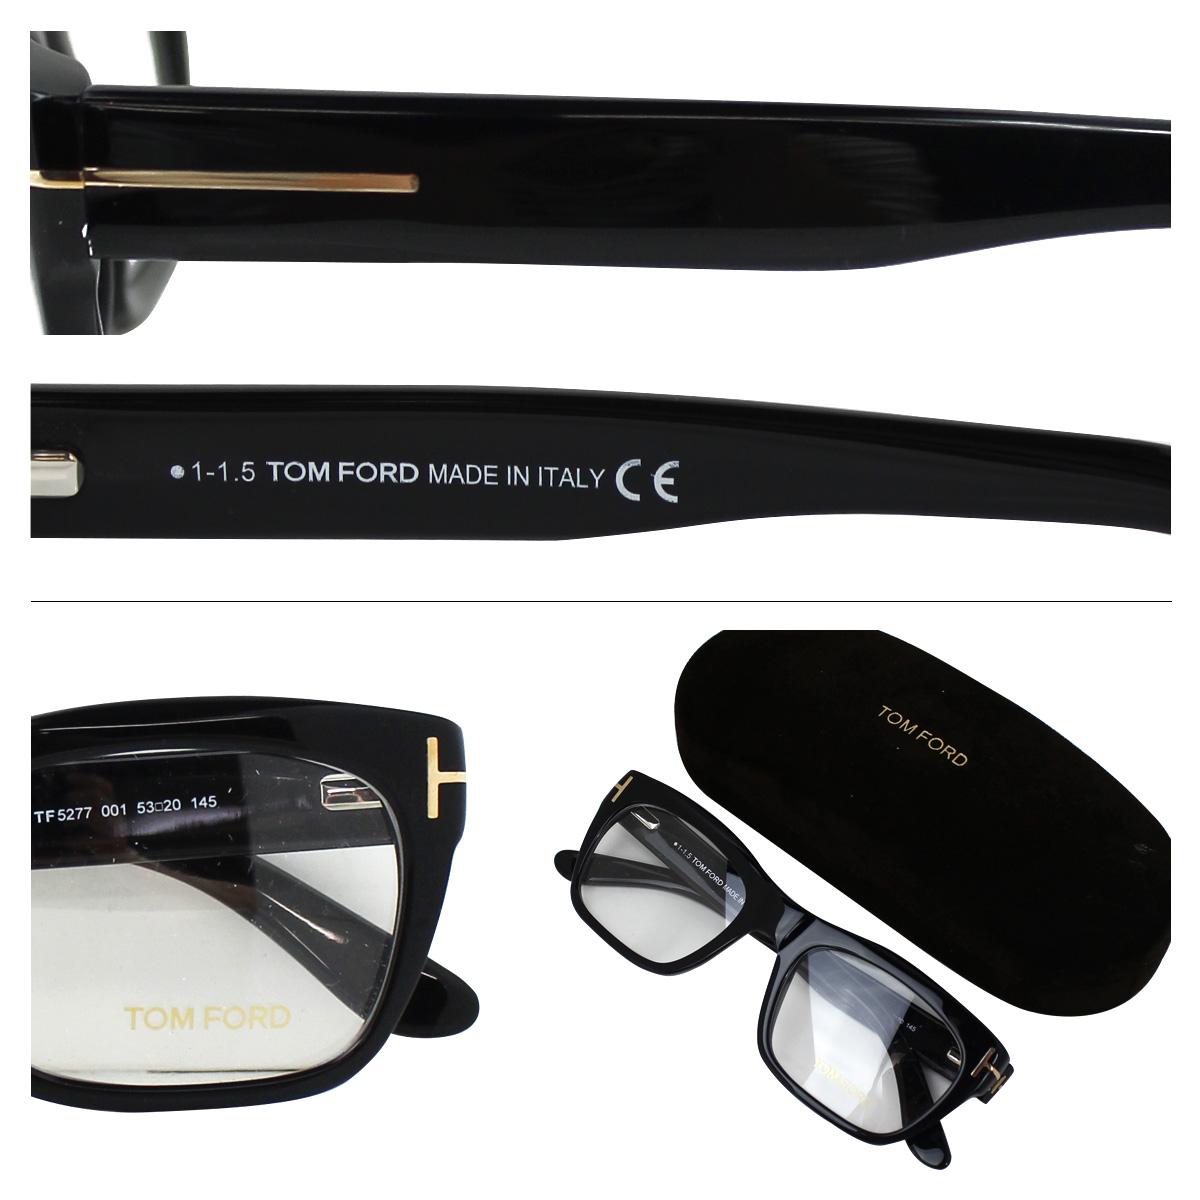 daffd0ce7f3 ALLSPORTS  Tom Ford TOM FORD men s women s eyeglasses eyewear ...